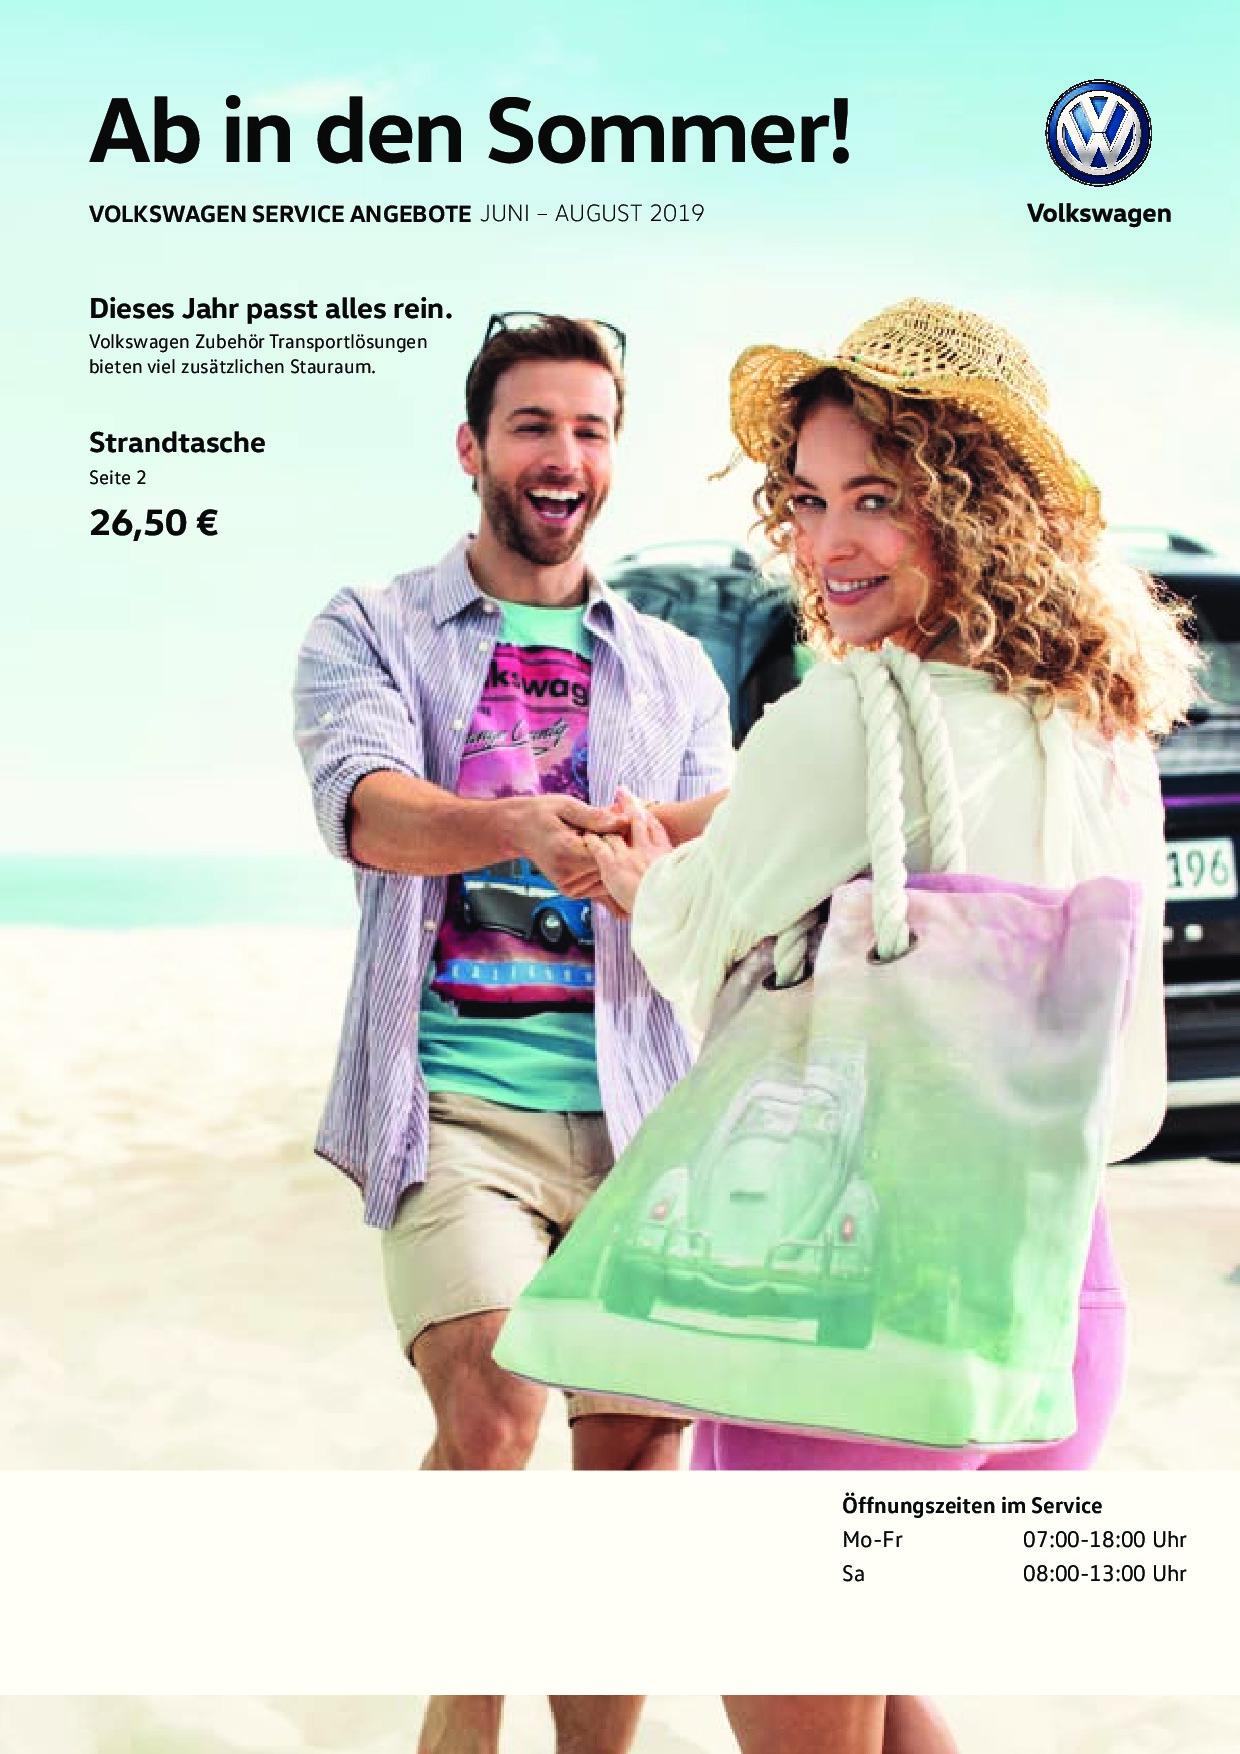 Prospekt Volkswagen Service Angebote Juni bis August 2019